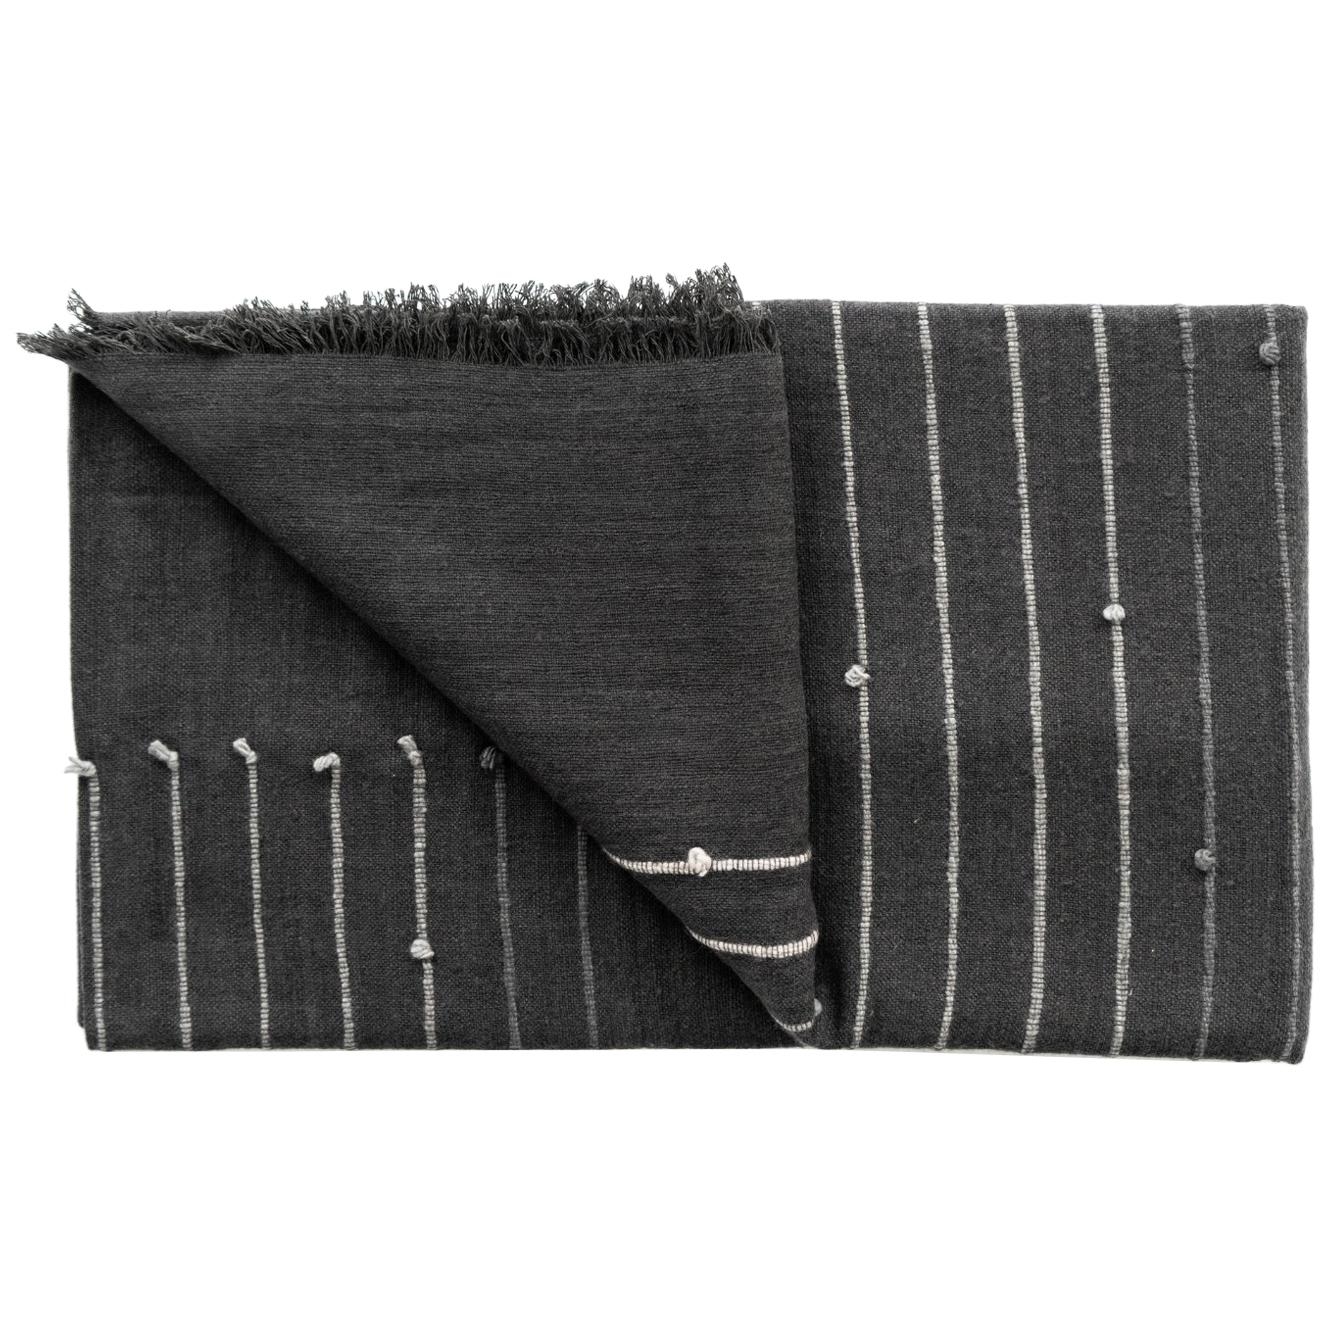 ALEI Black Cotton Merino Handloom Throw / Blanket In Stripes Pattern